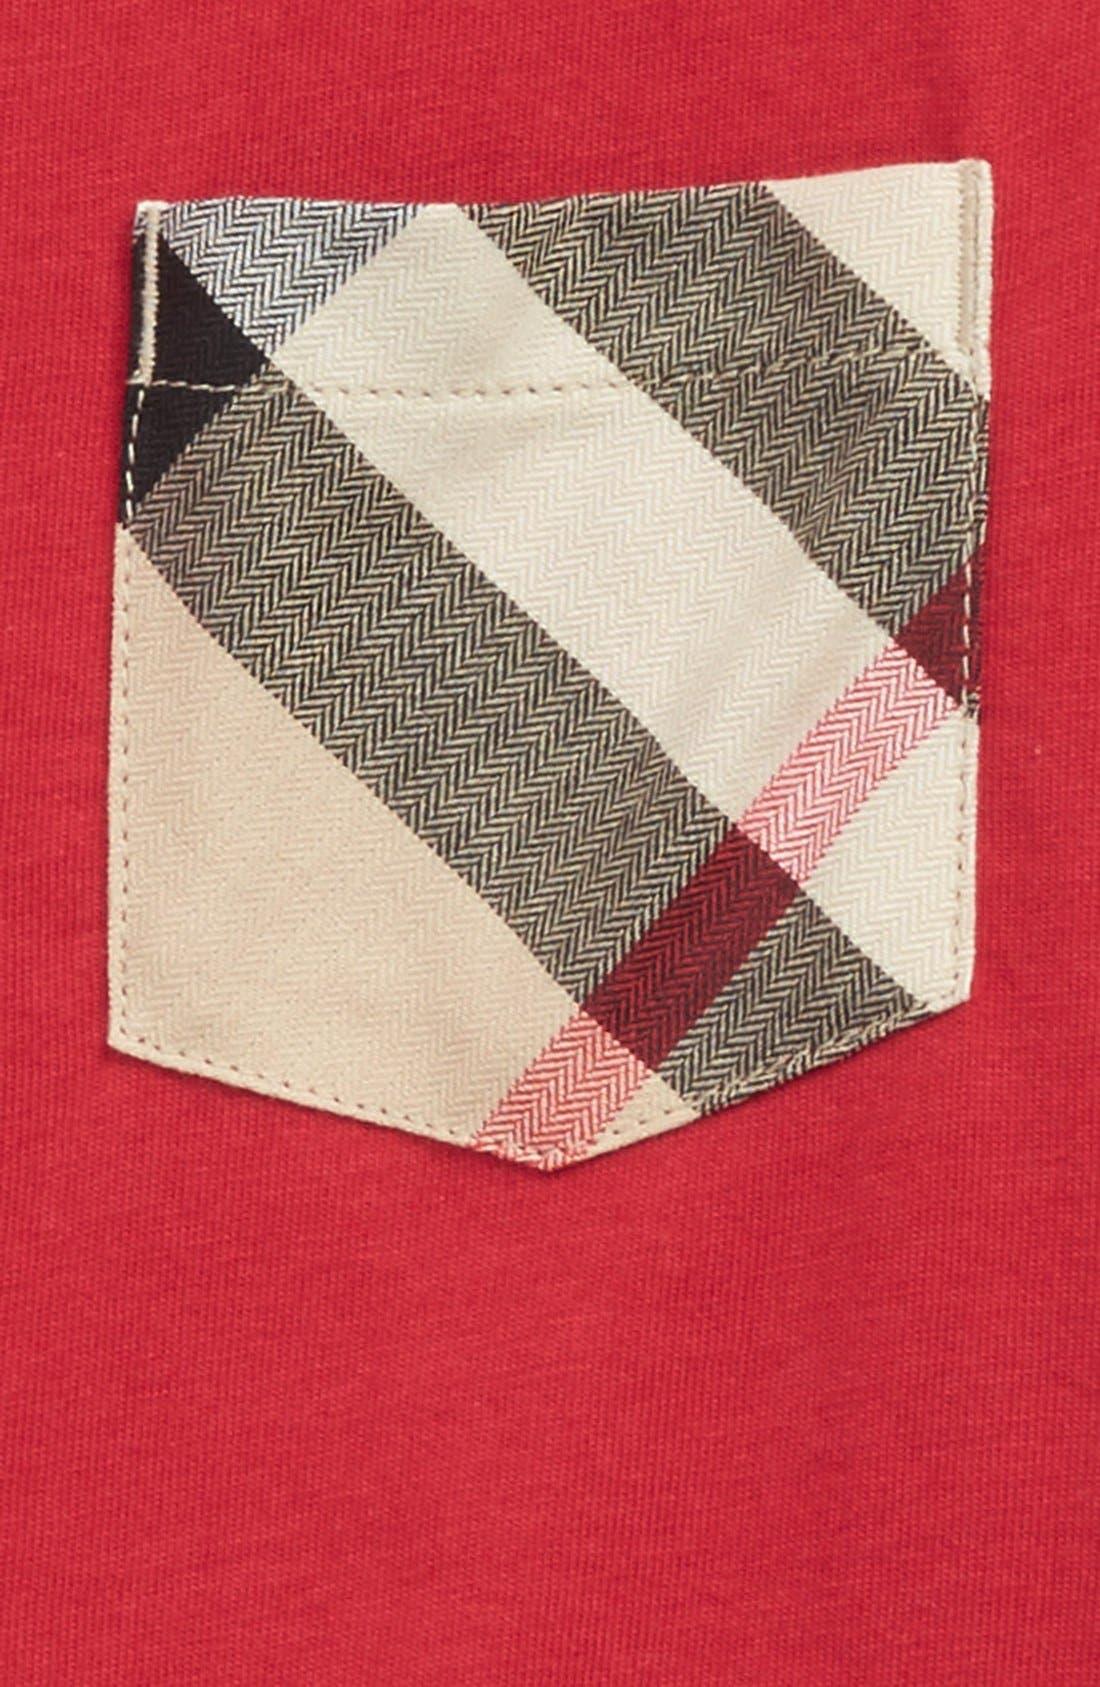 'Callum' Check Print Chest Pocket T-Shirt,                             Alternate thumbnail 2, color,